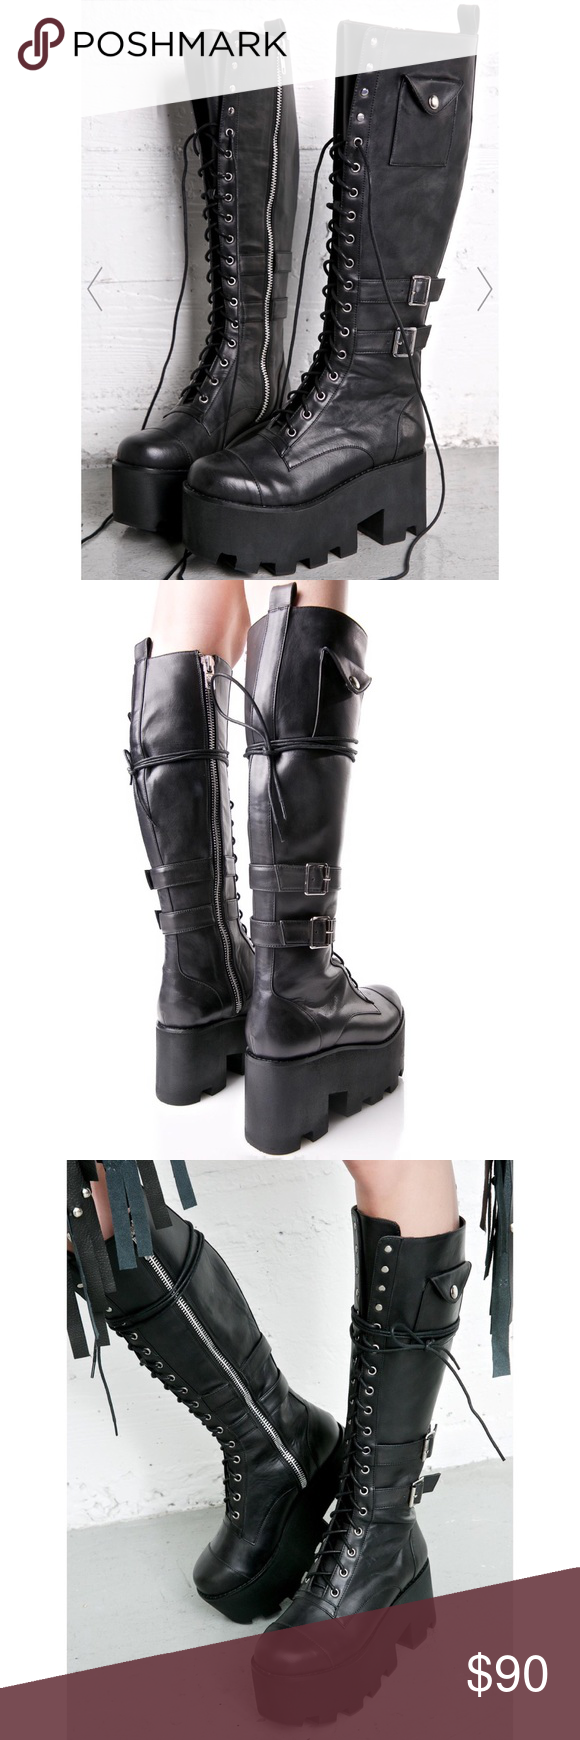 564596853d0aa Current Mood Boots (dolls skill) Jane Doe Boots - Current Mood ( dolls kill  ) BRAND NEW - never worn   size 9 3.5